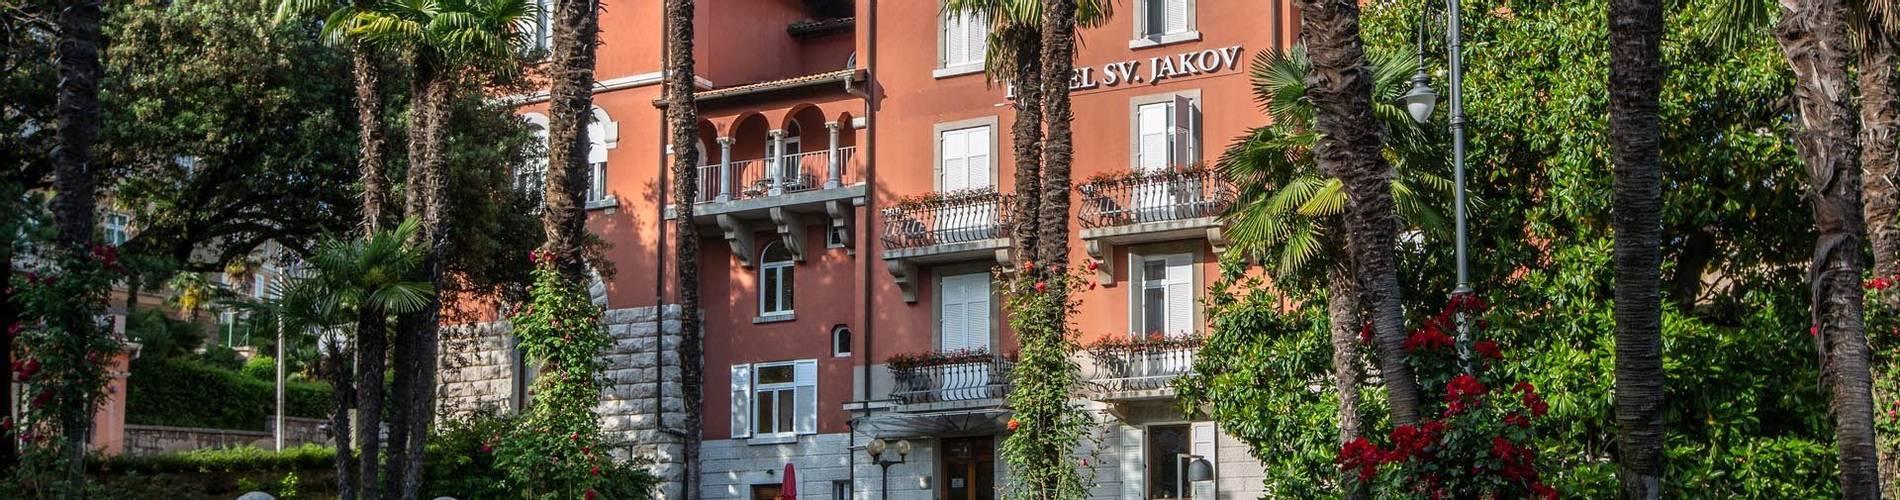 AP-WEB-16-9-OPATIJA-TAIB-01-Hotel-Sveti-Jakov-1920x1080-c.jpg